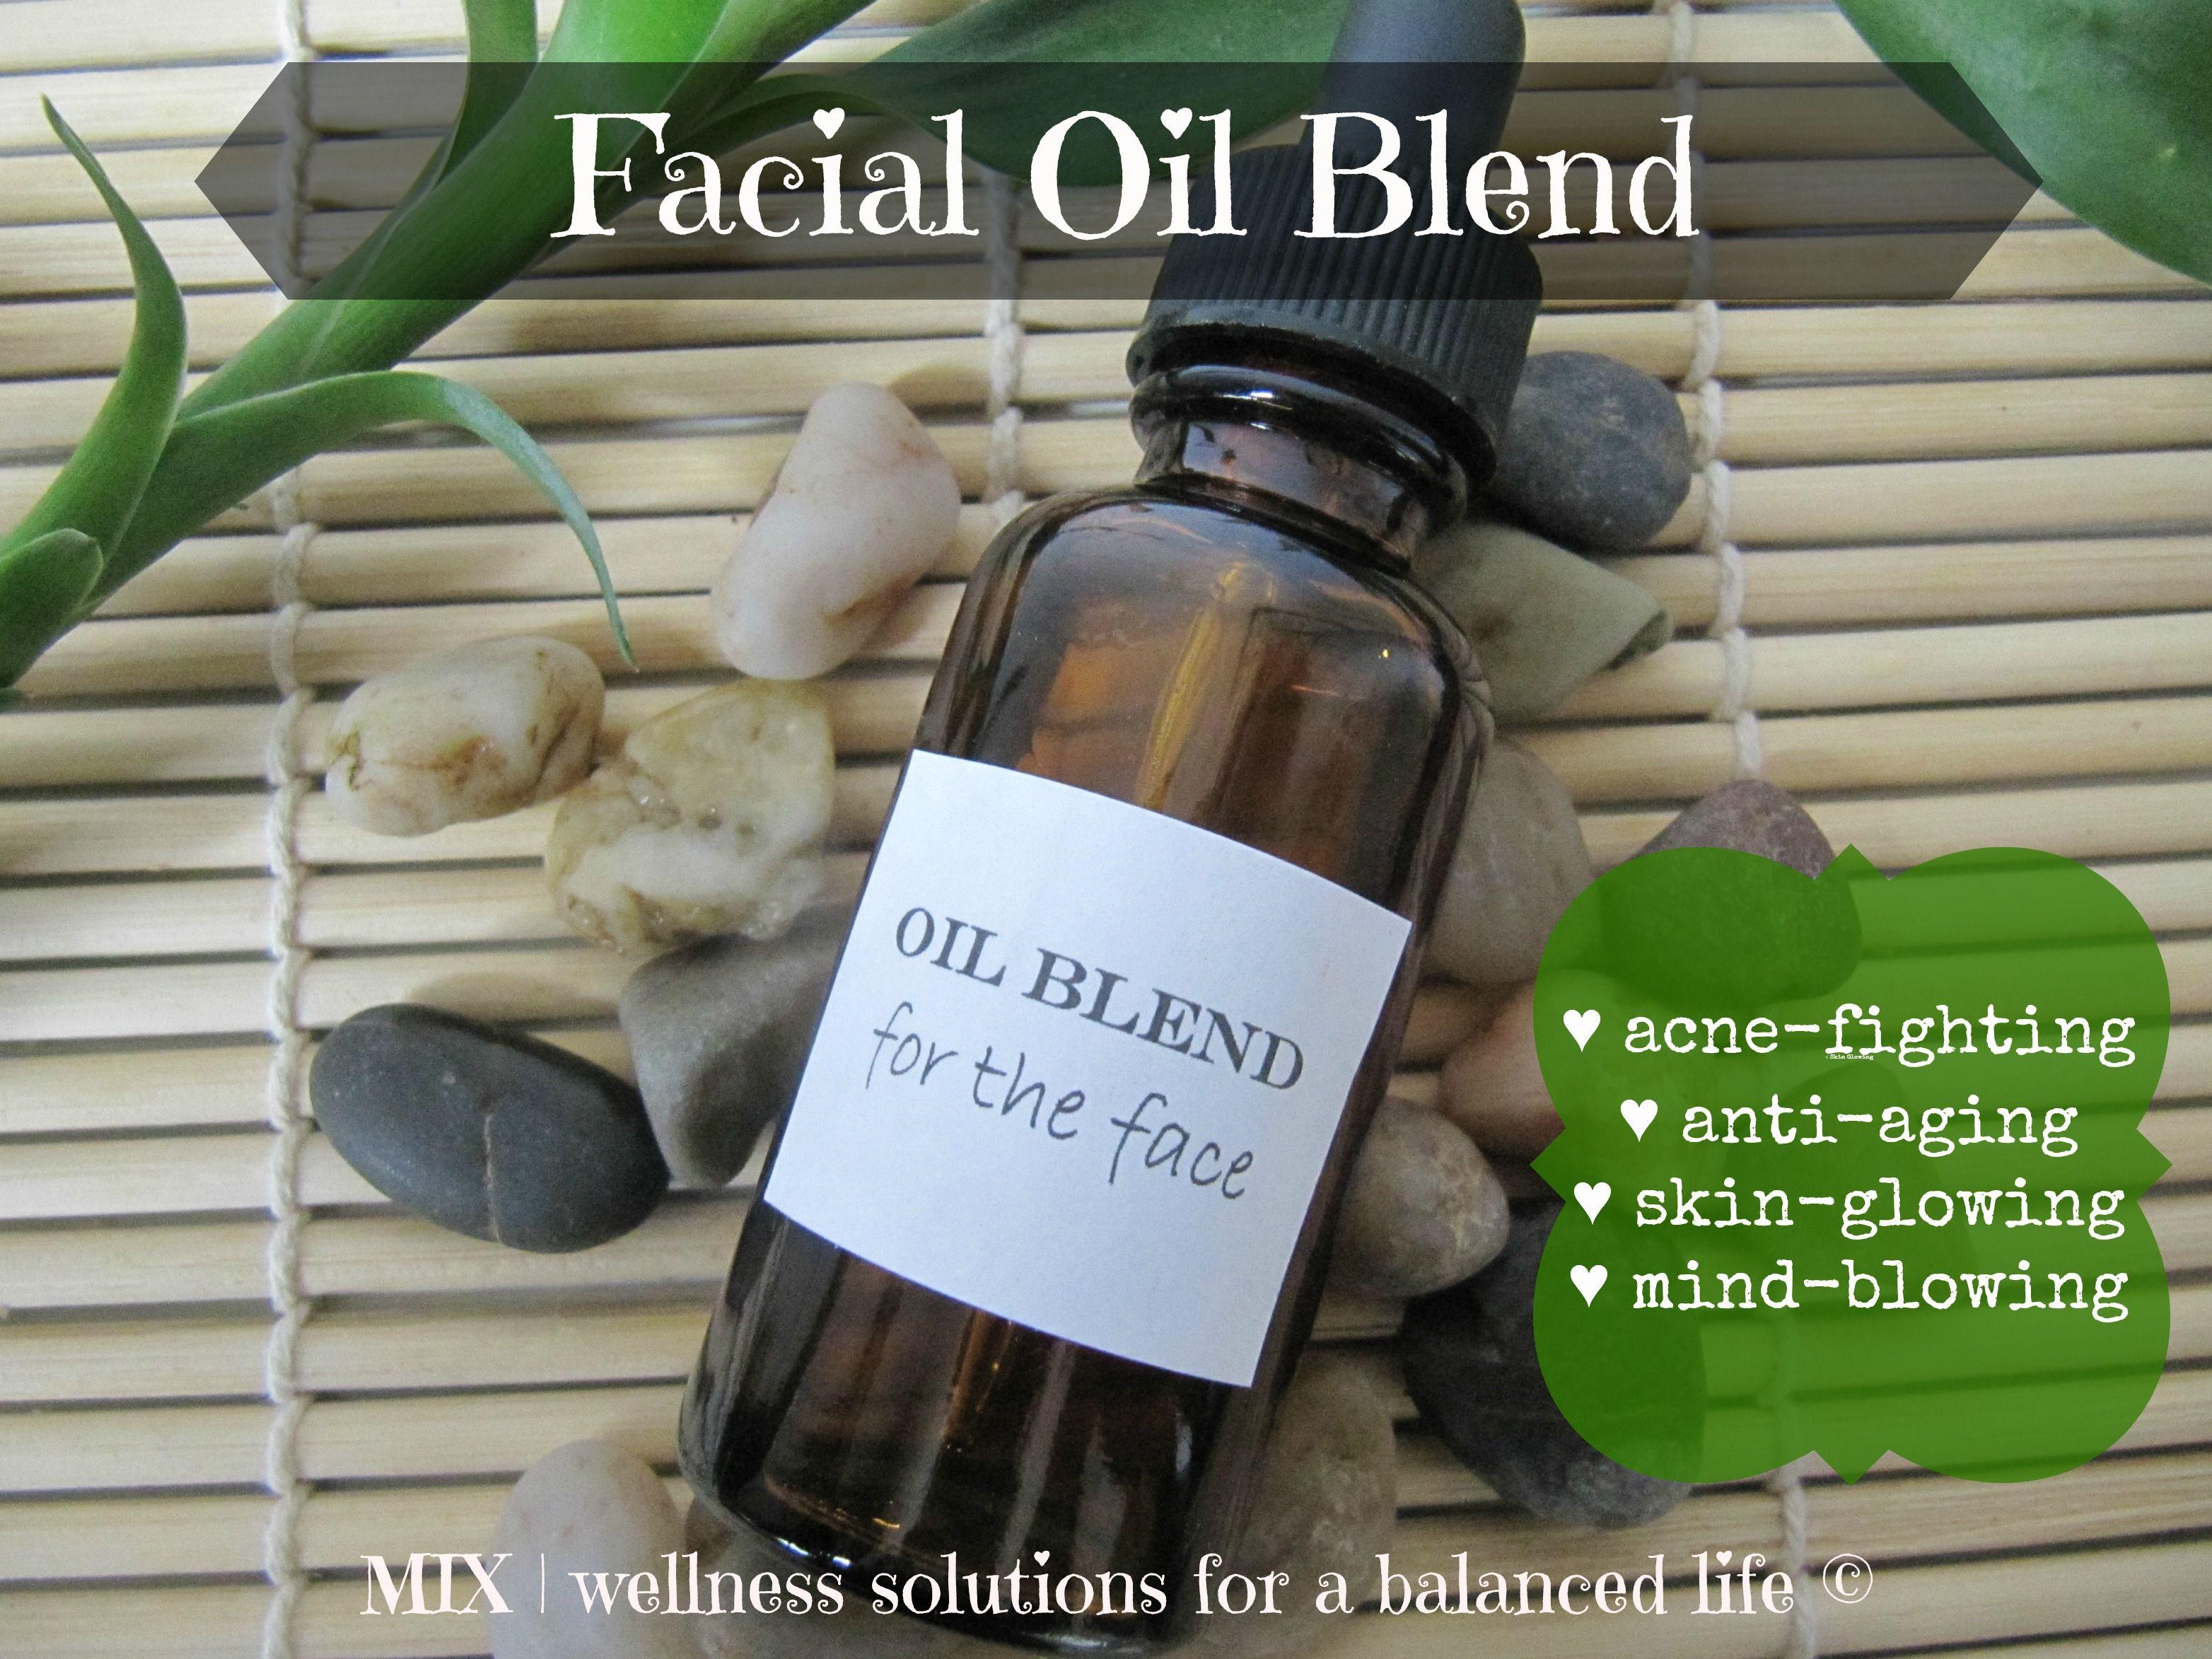 Diy Anti Aging Face Serum Recipe Facial Oil Blend Oils Natural Skin Care